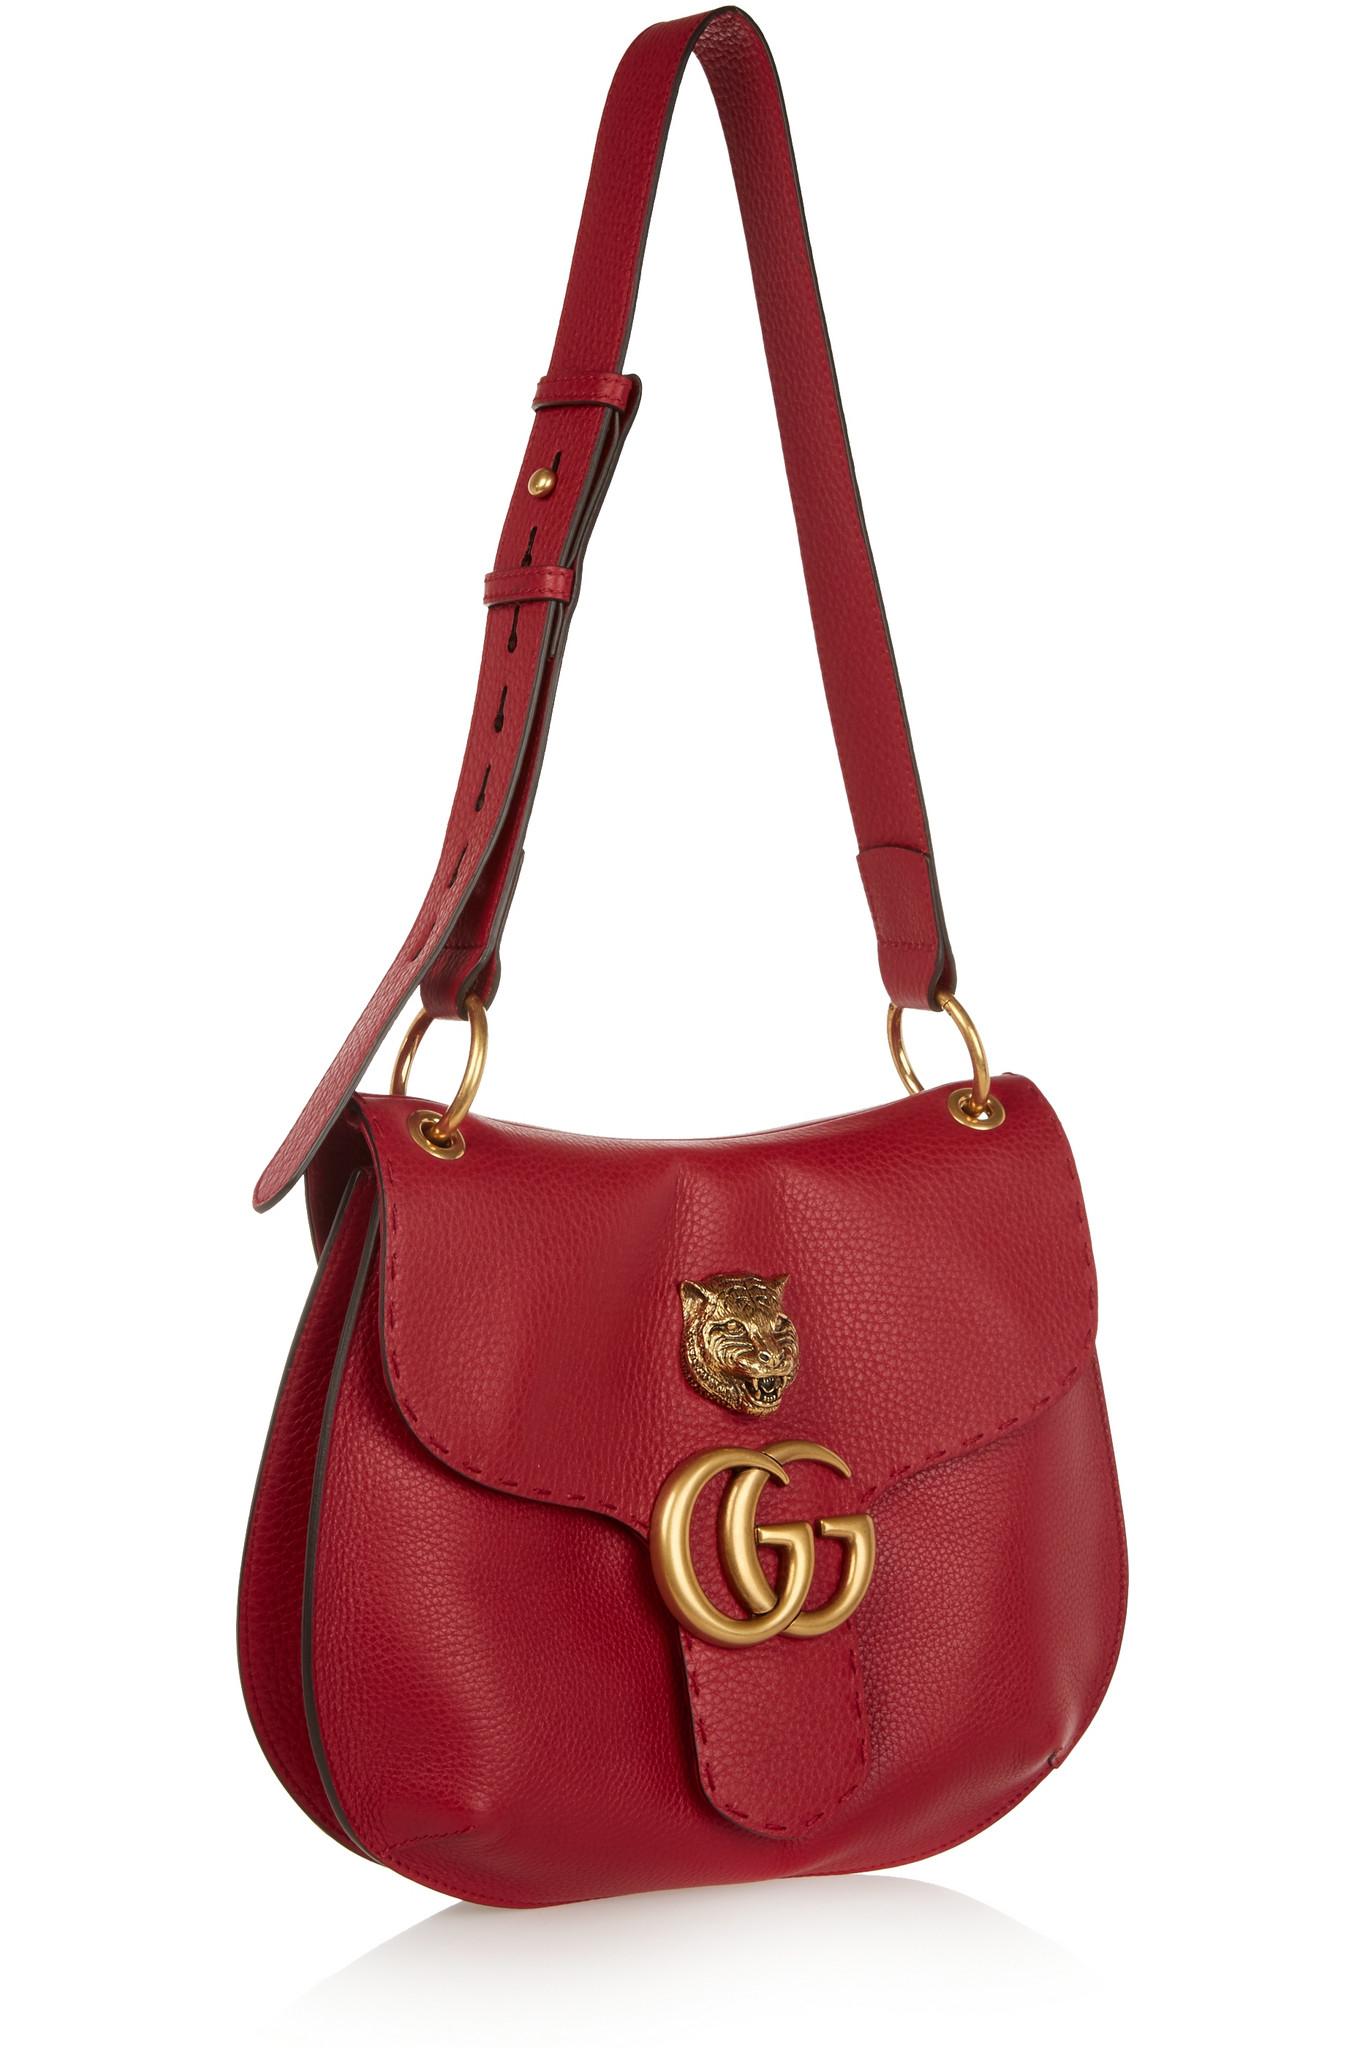 daa812800f5 Gucci Marmont Small Shoulder Bag Red